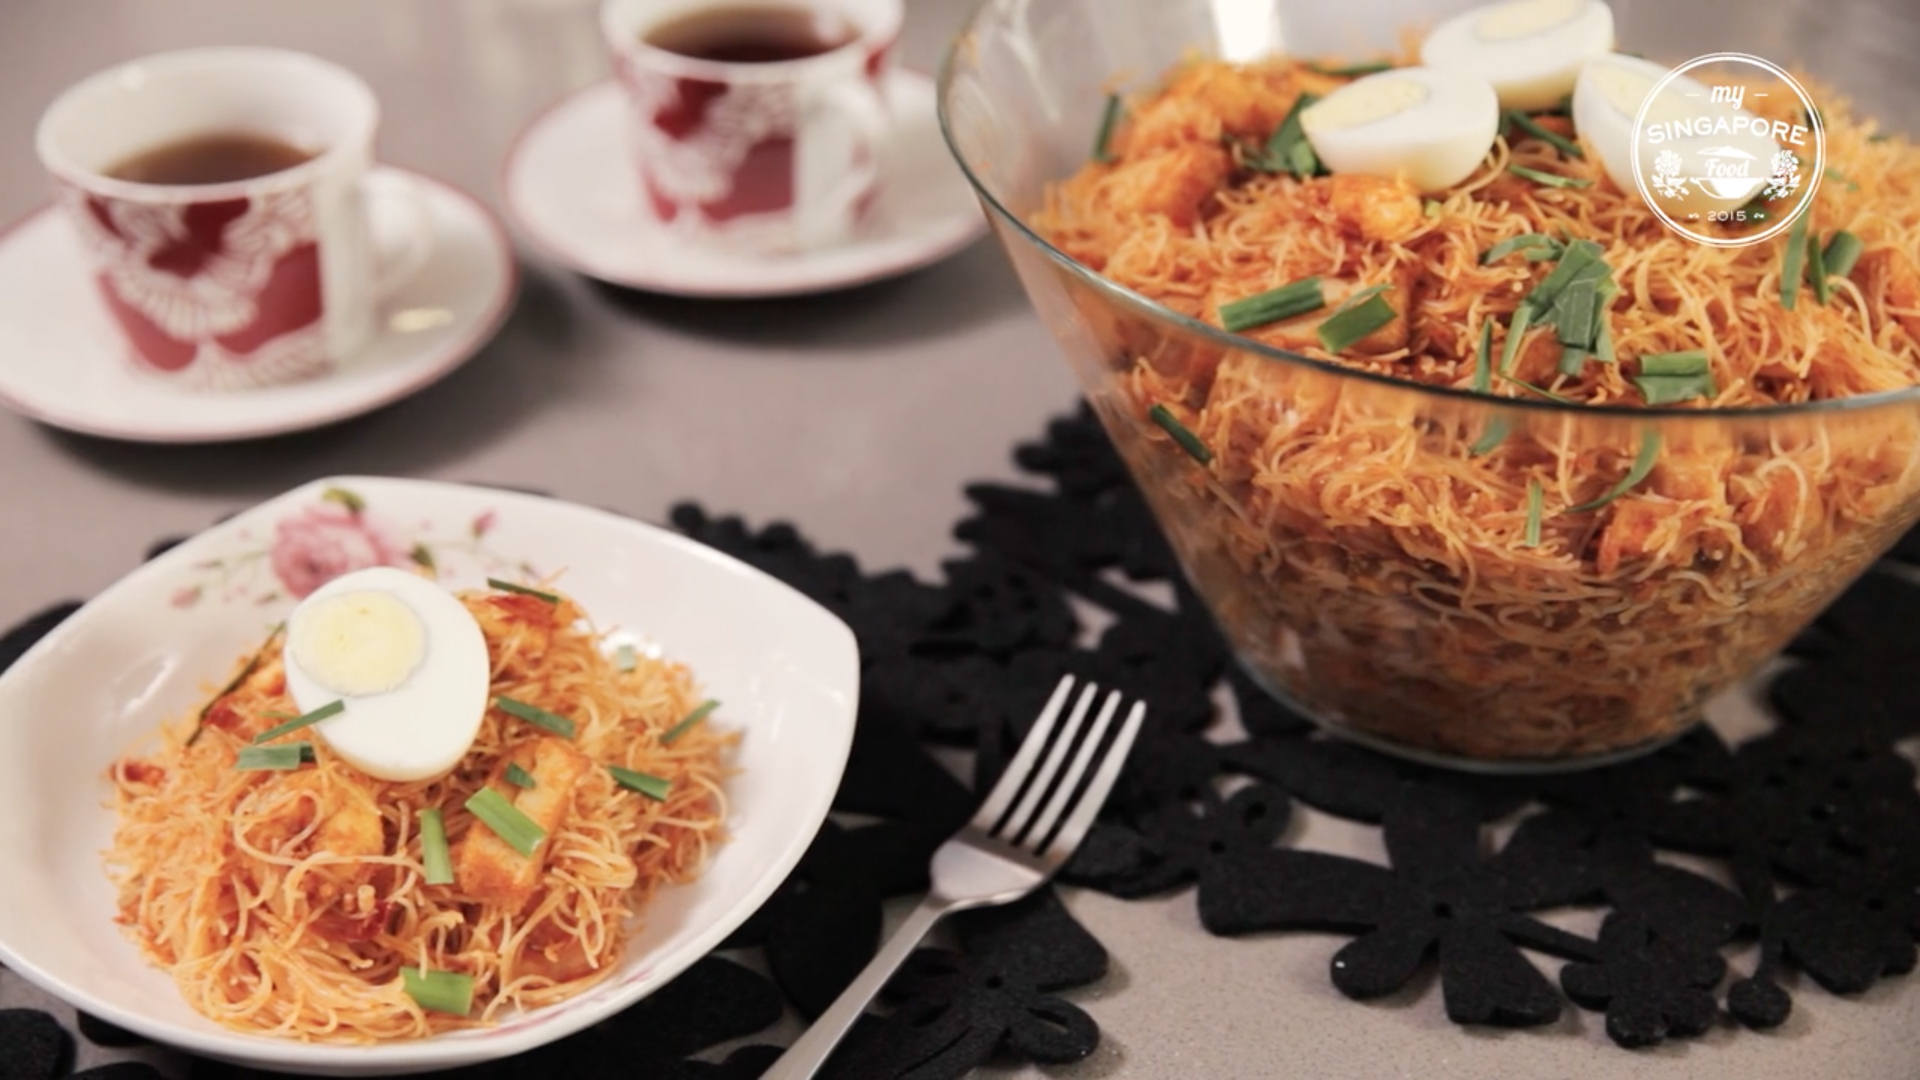 Mee Siam Goreng - My Singapore Food